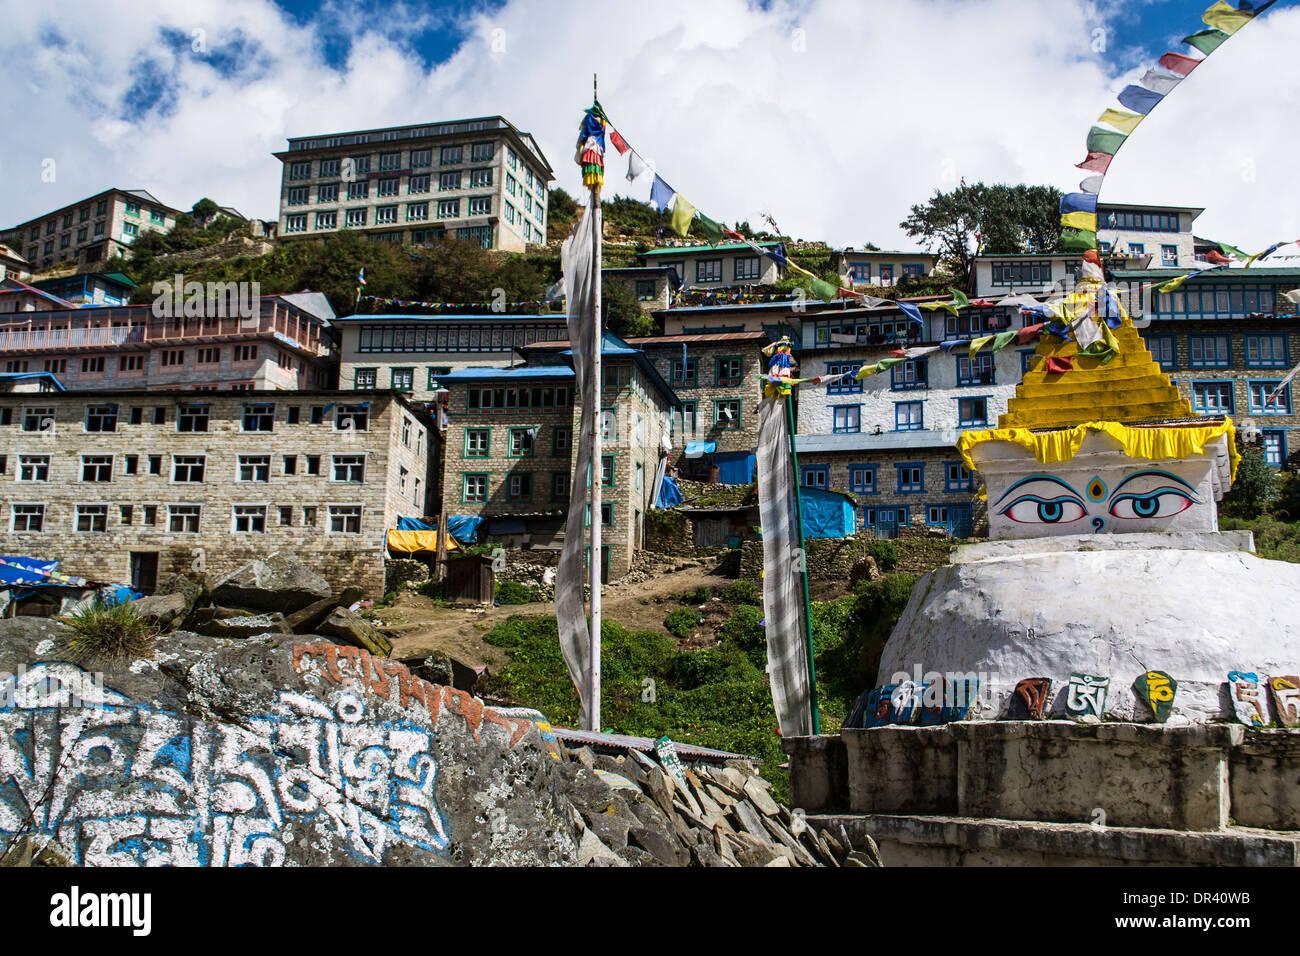 Village in Himalayas - Stock Image